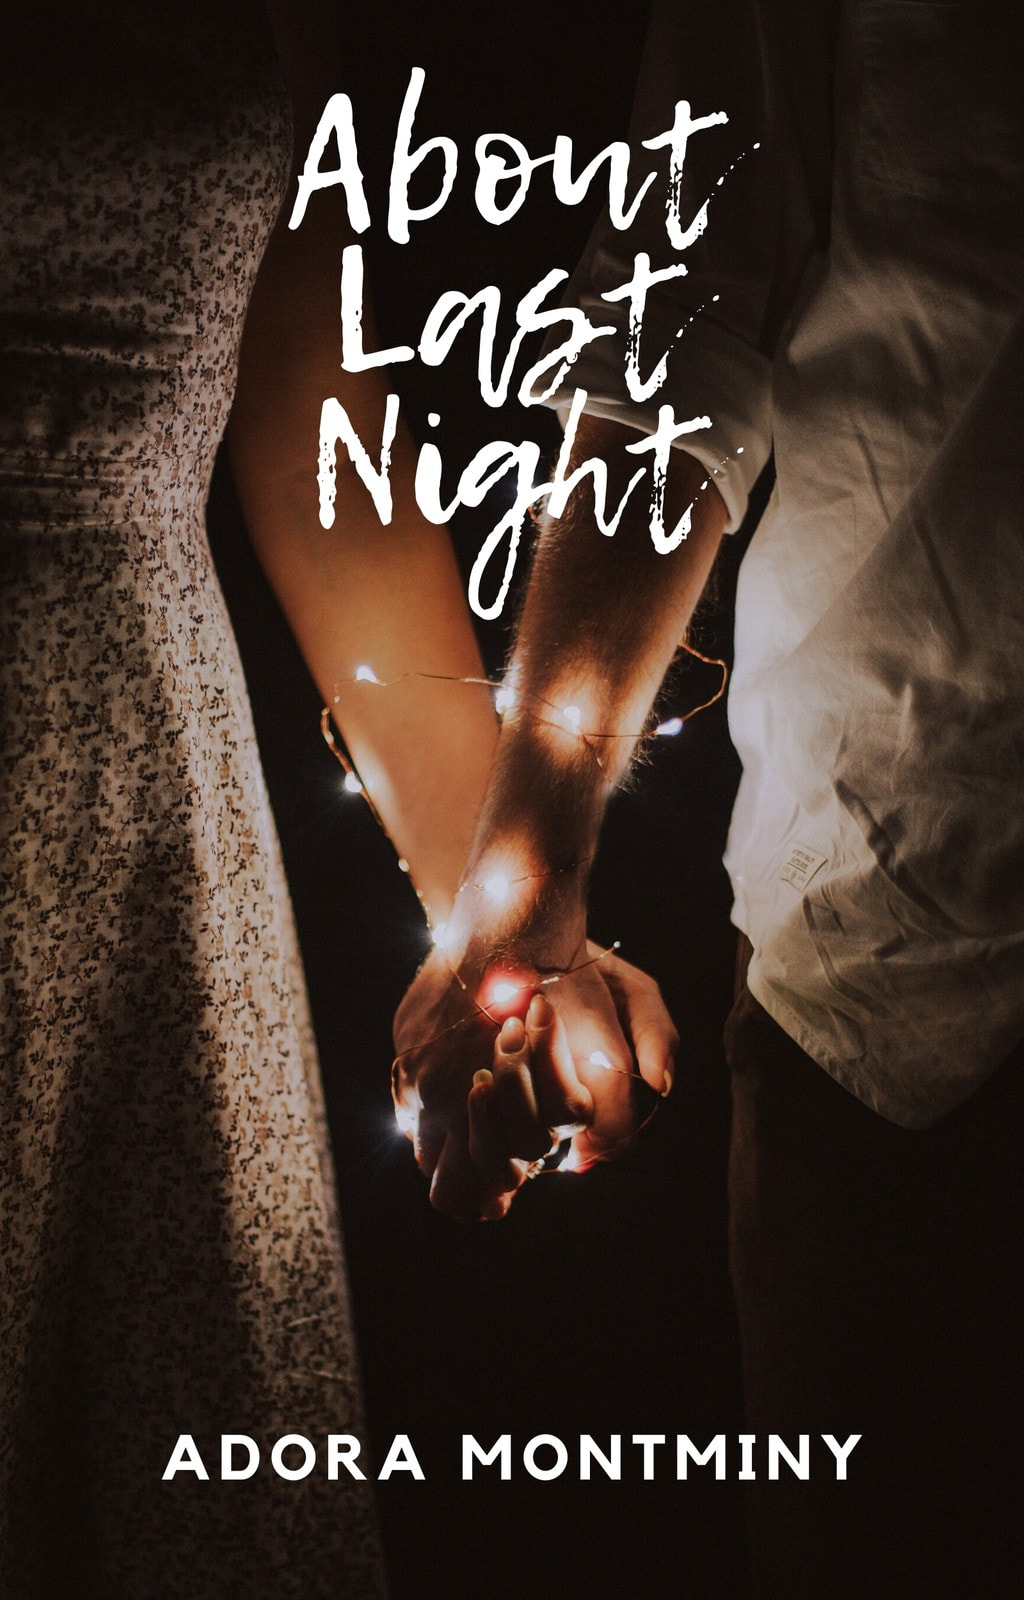 Couple Silhouette Romance/Chick Lit Book Cover